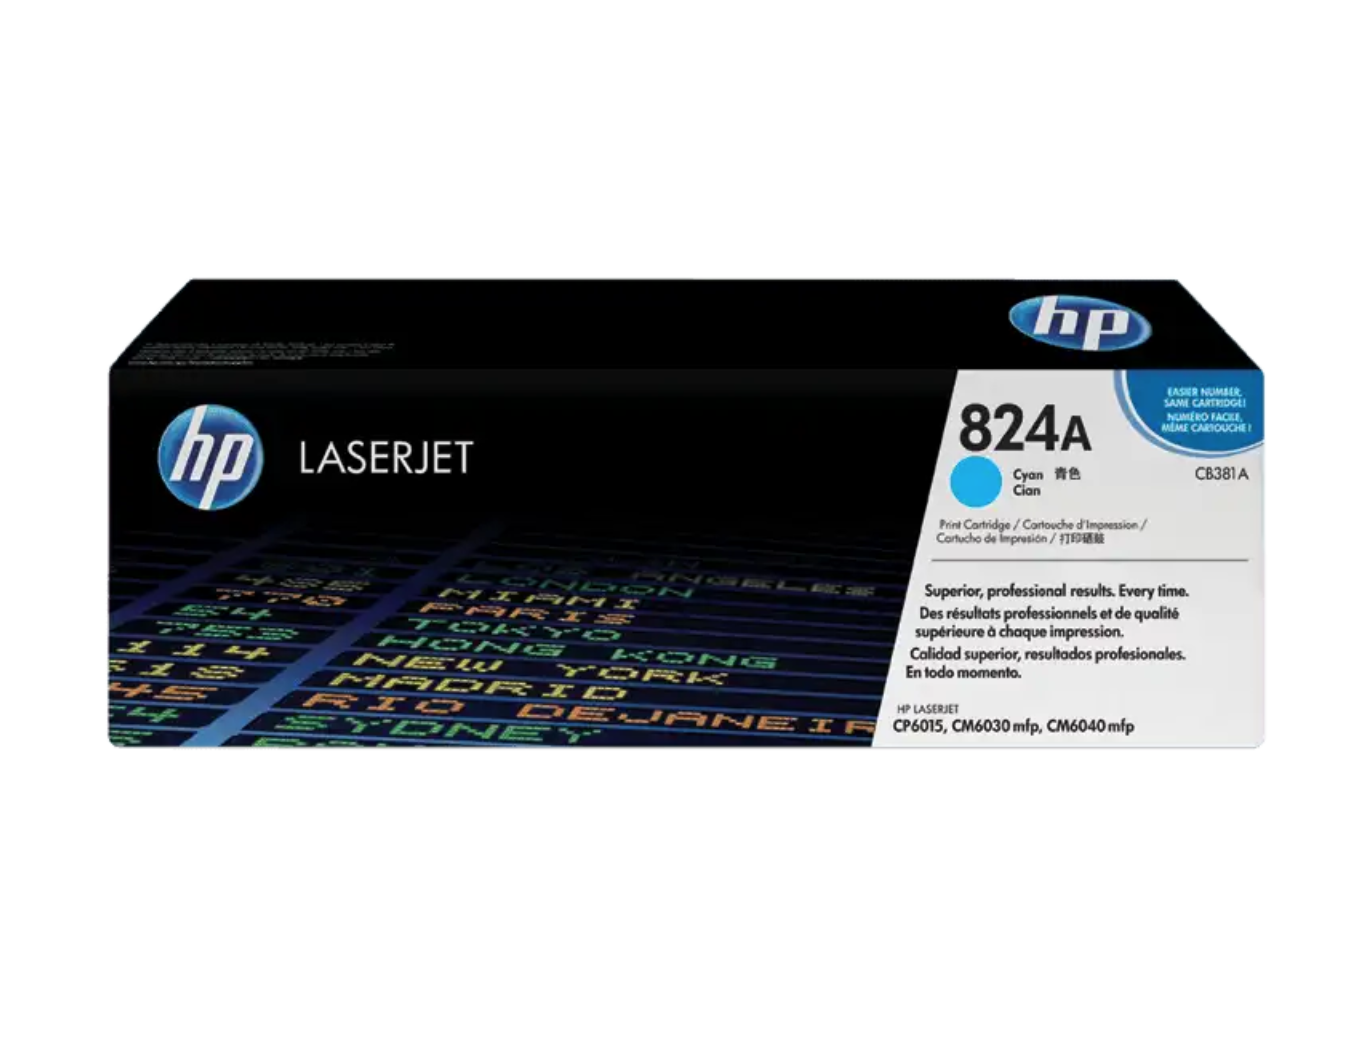 HP 824A 綻藍原廠 LaserJet 碳粉 CB381A